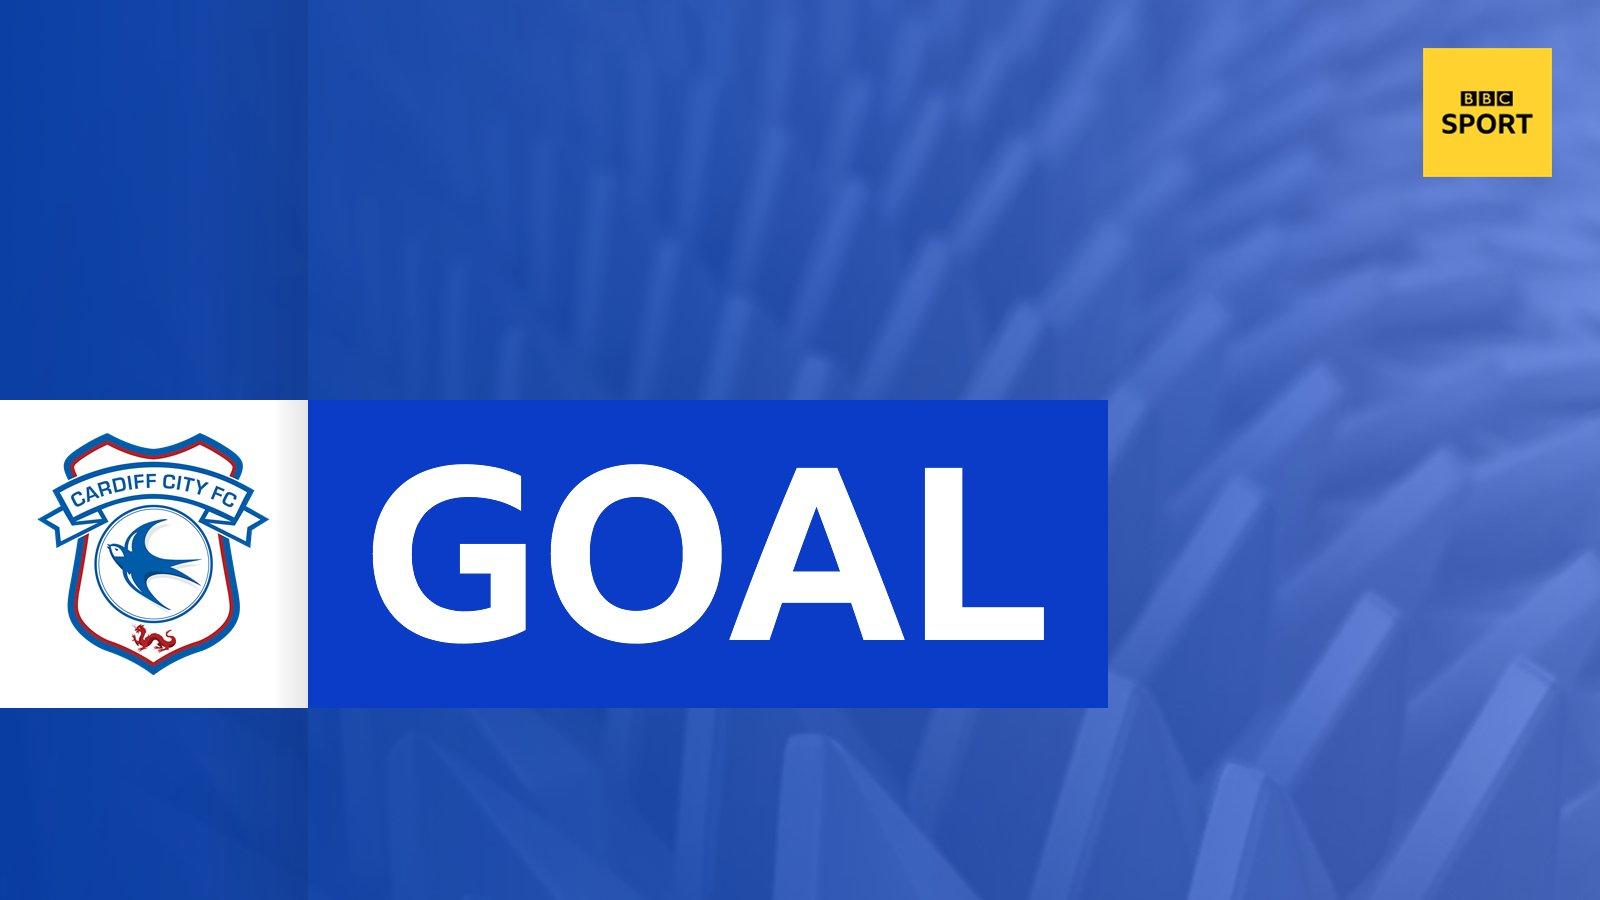 GOAL!  Kadeem Harris delivers a two-goal cushion!  Cardiff 4-2 Fulham  LIVE: https://t.co/kR1pB6qG5b #CARFUL https://t.co/GHowvDoaOO